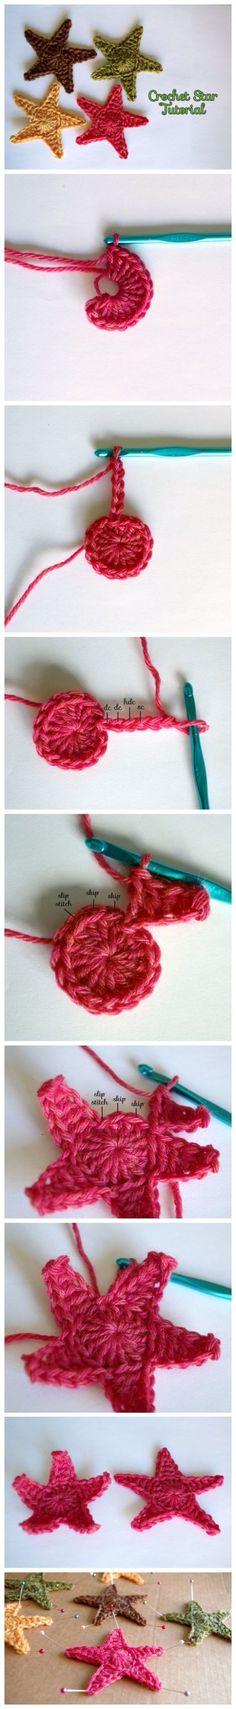 How to make a crochet star | DIY